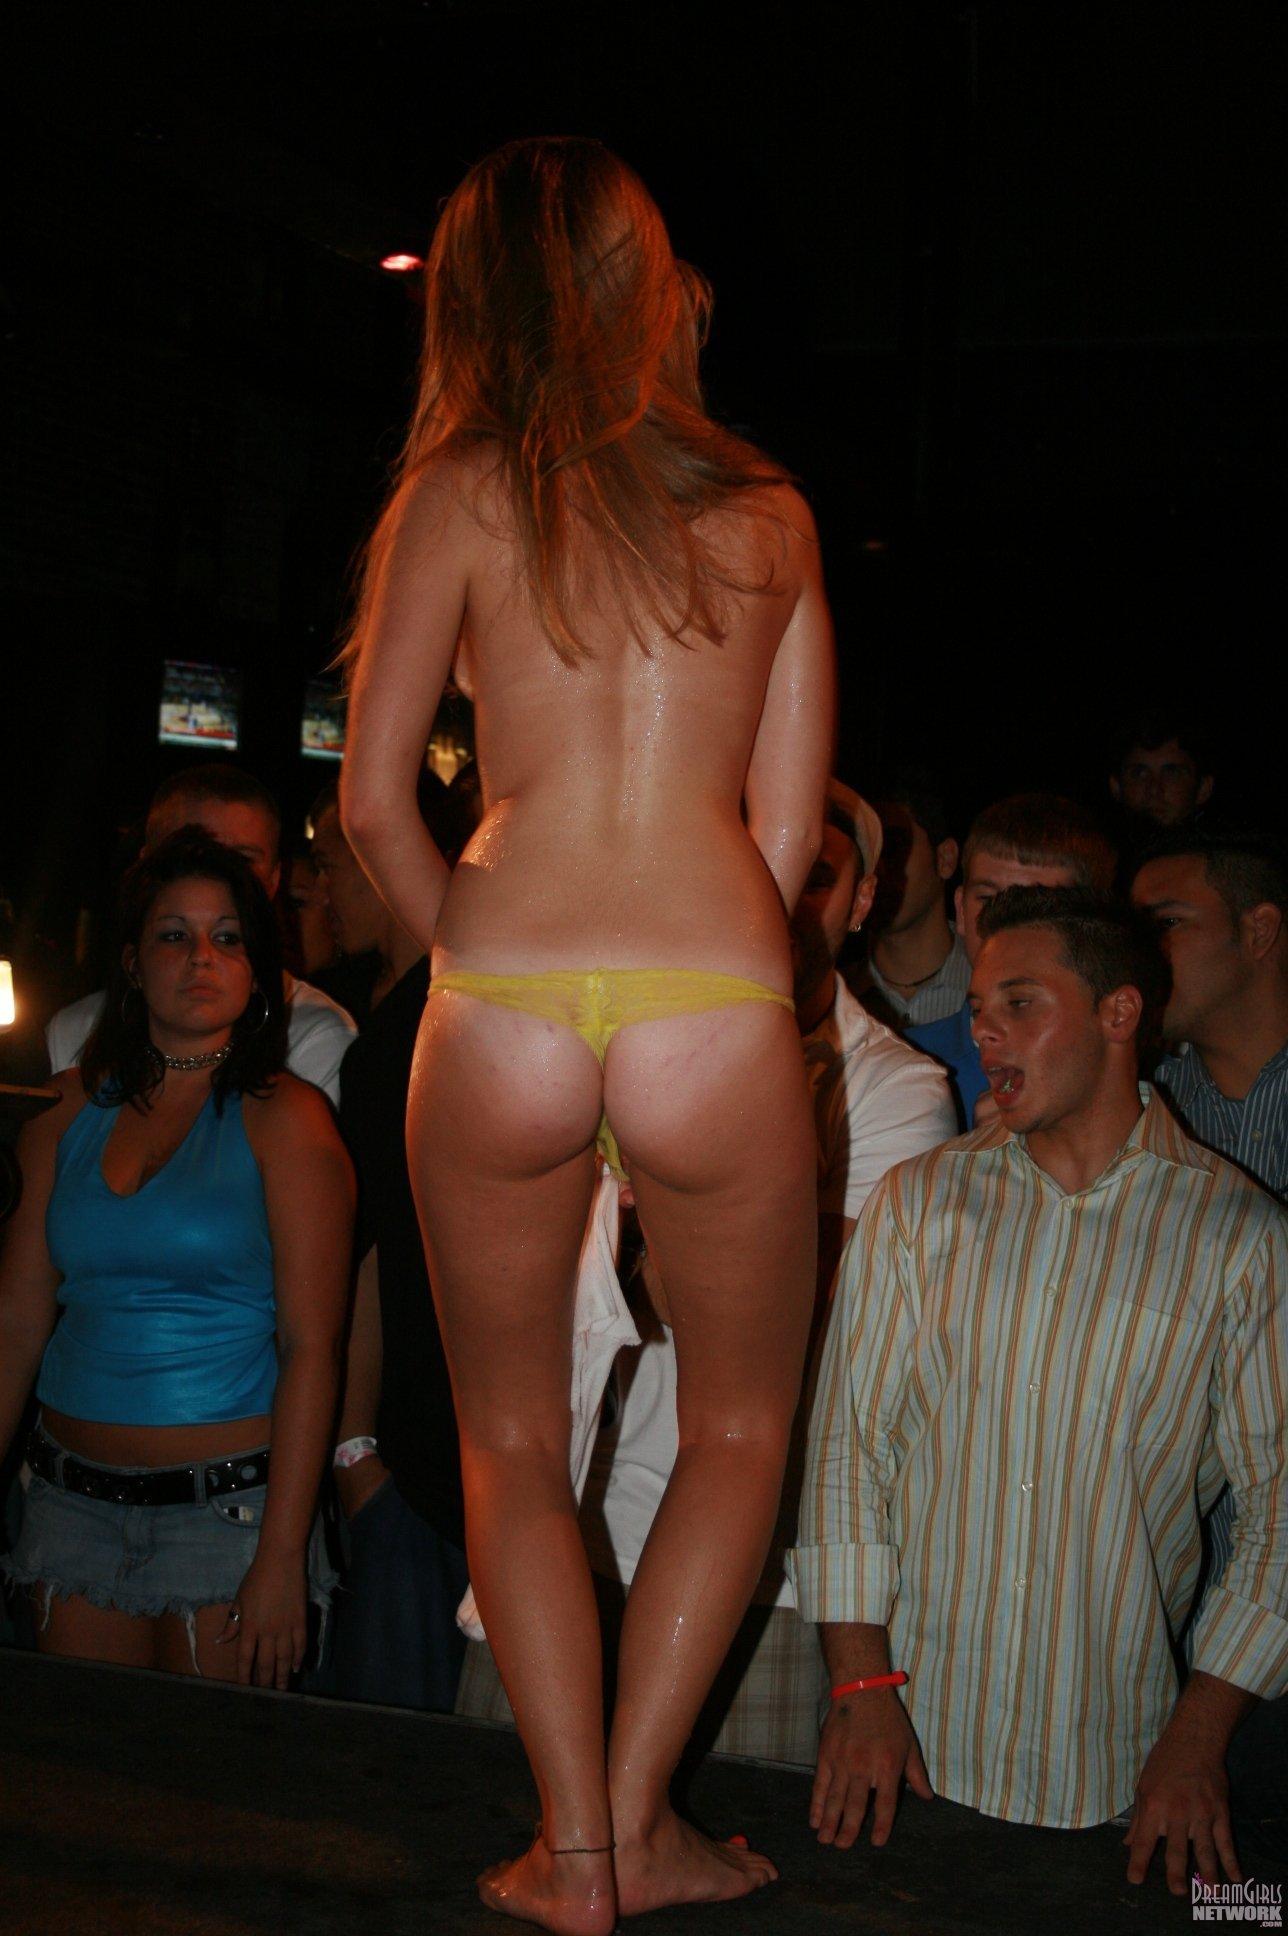 And wild strip contest slut load number